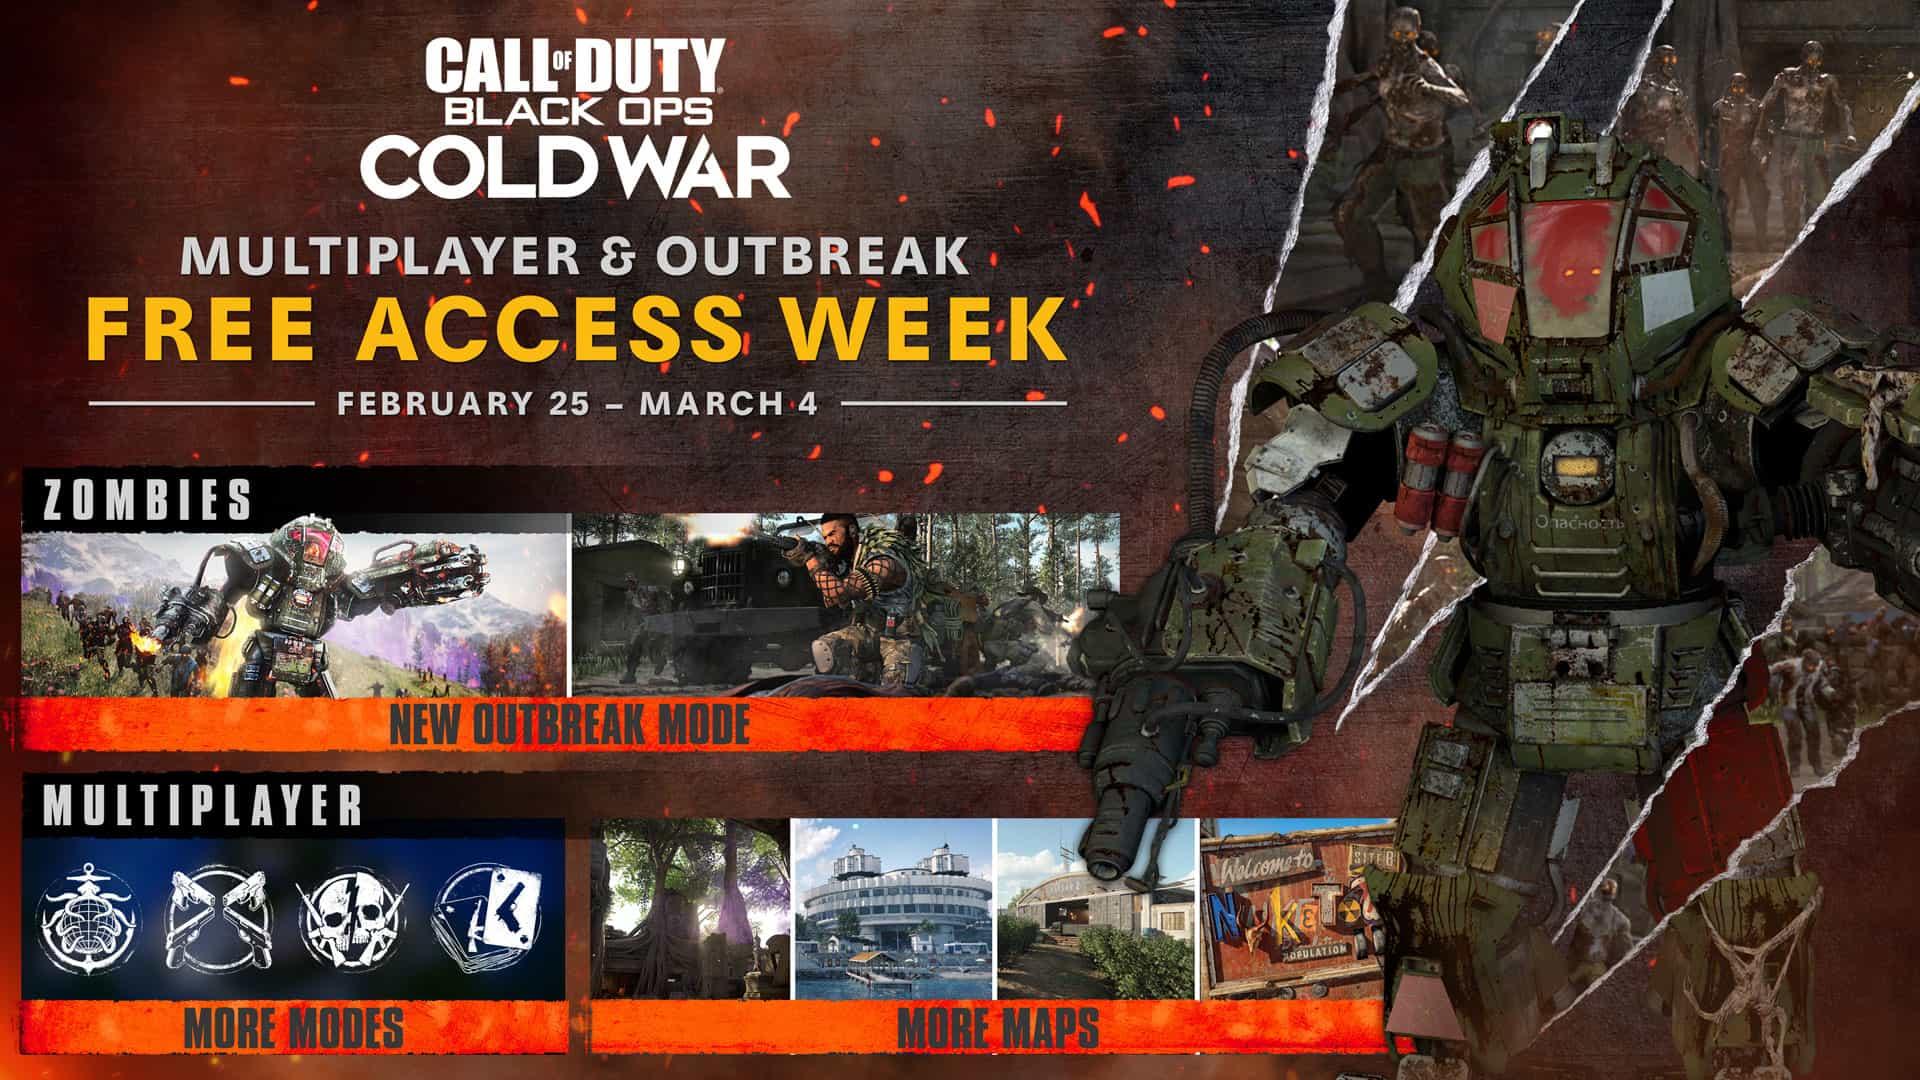 Gratis Call of Duty: Black Ops Cold War (multiplayer en zombies) (25 feb - 4 mrt)